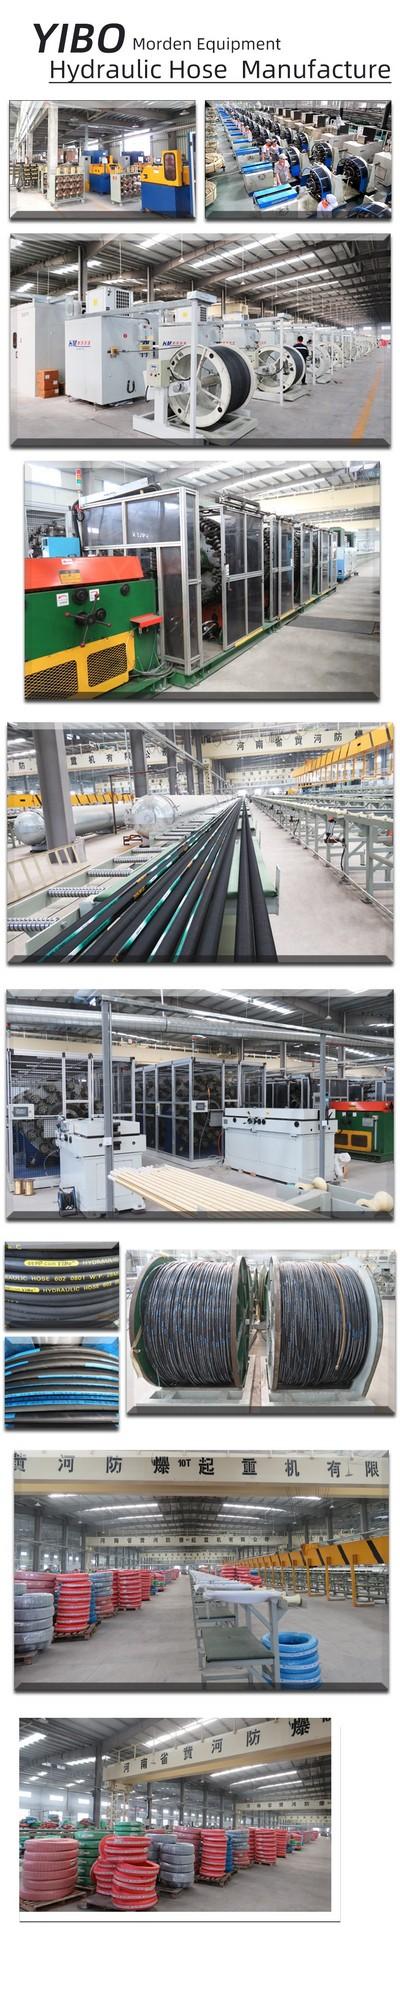 sae 100r10 reinforced hydraulic rubber hose 4